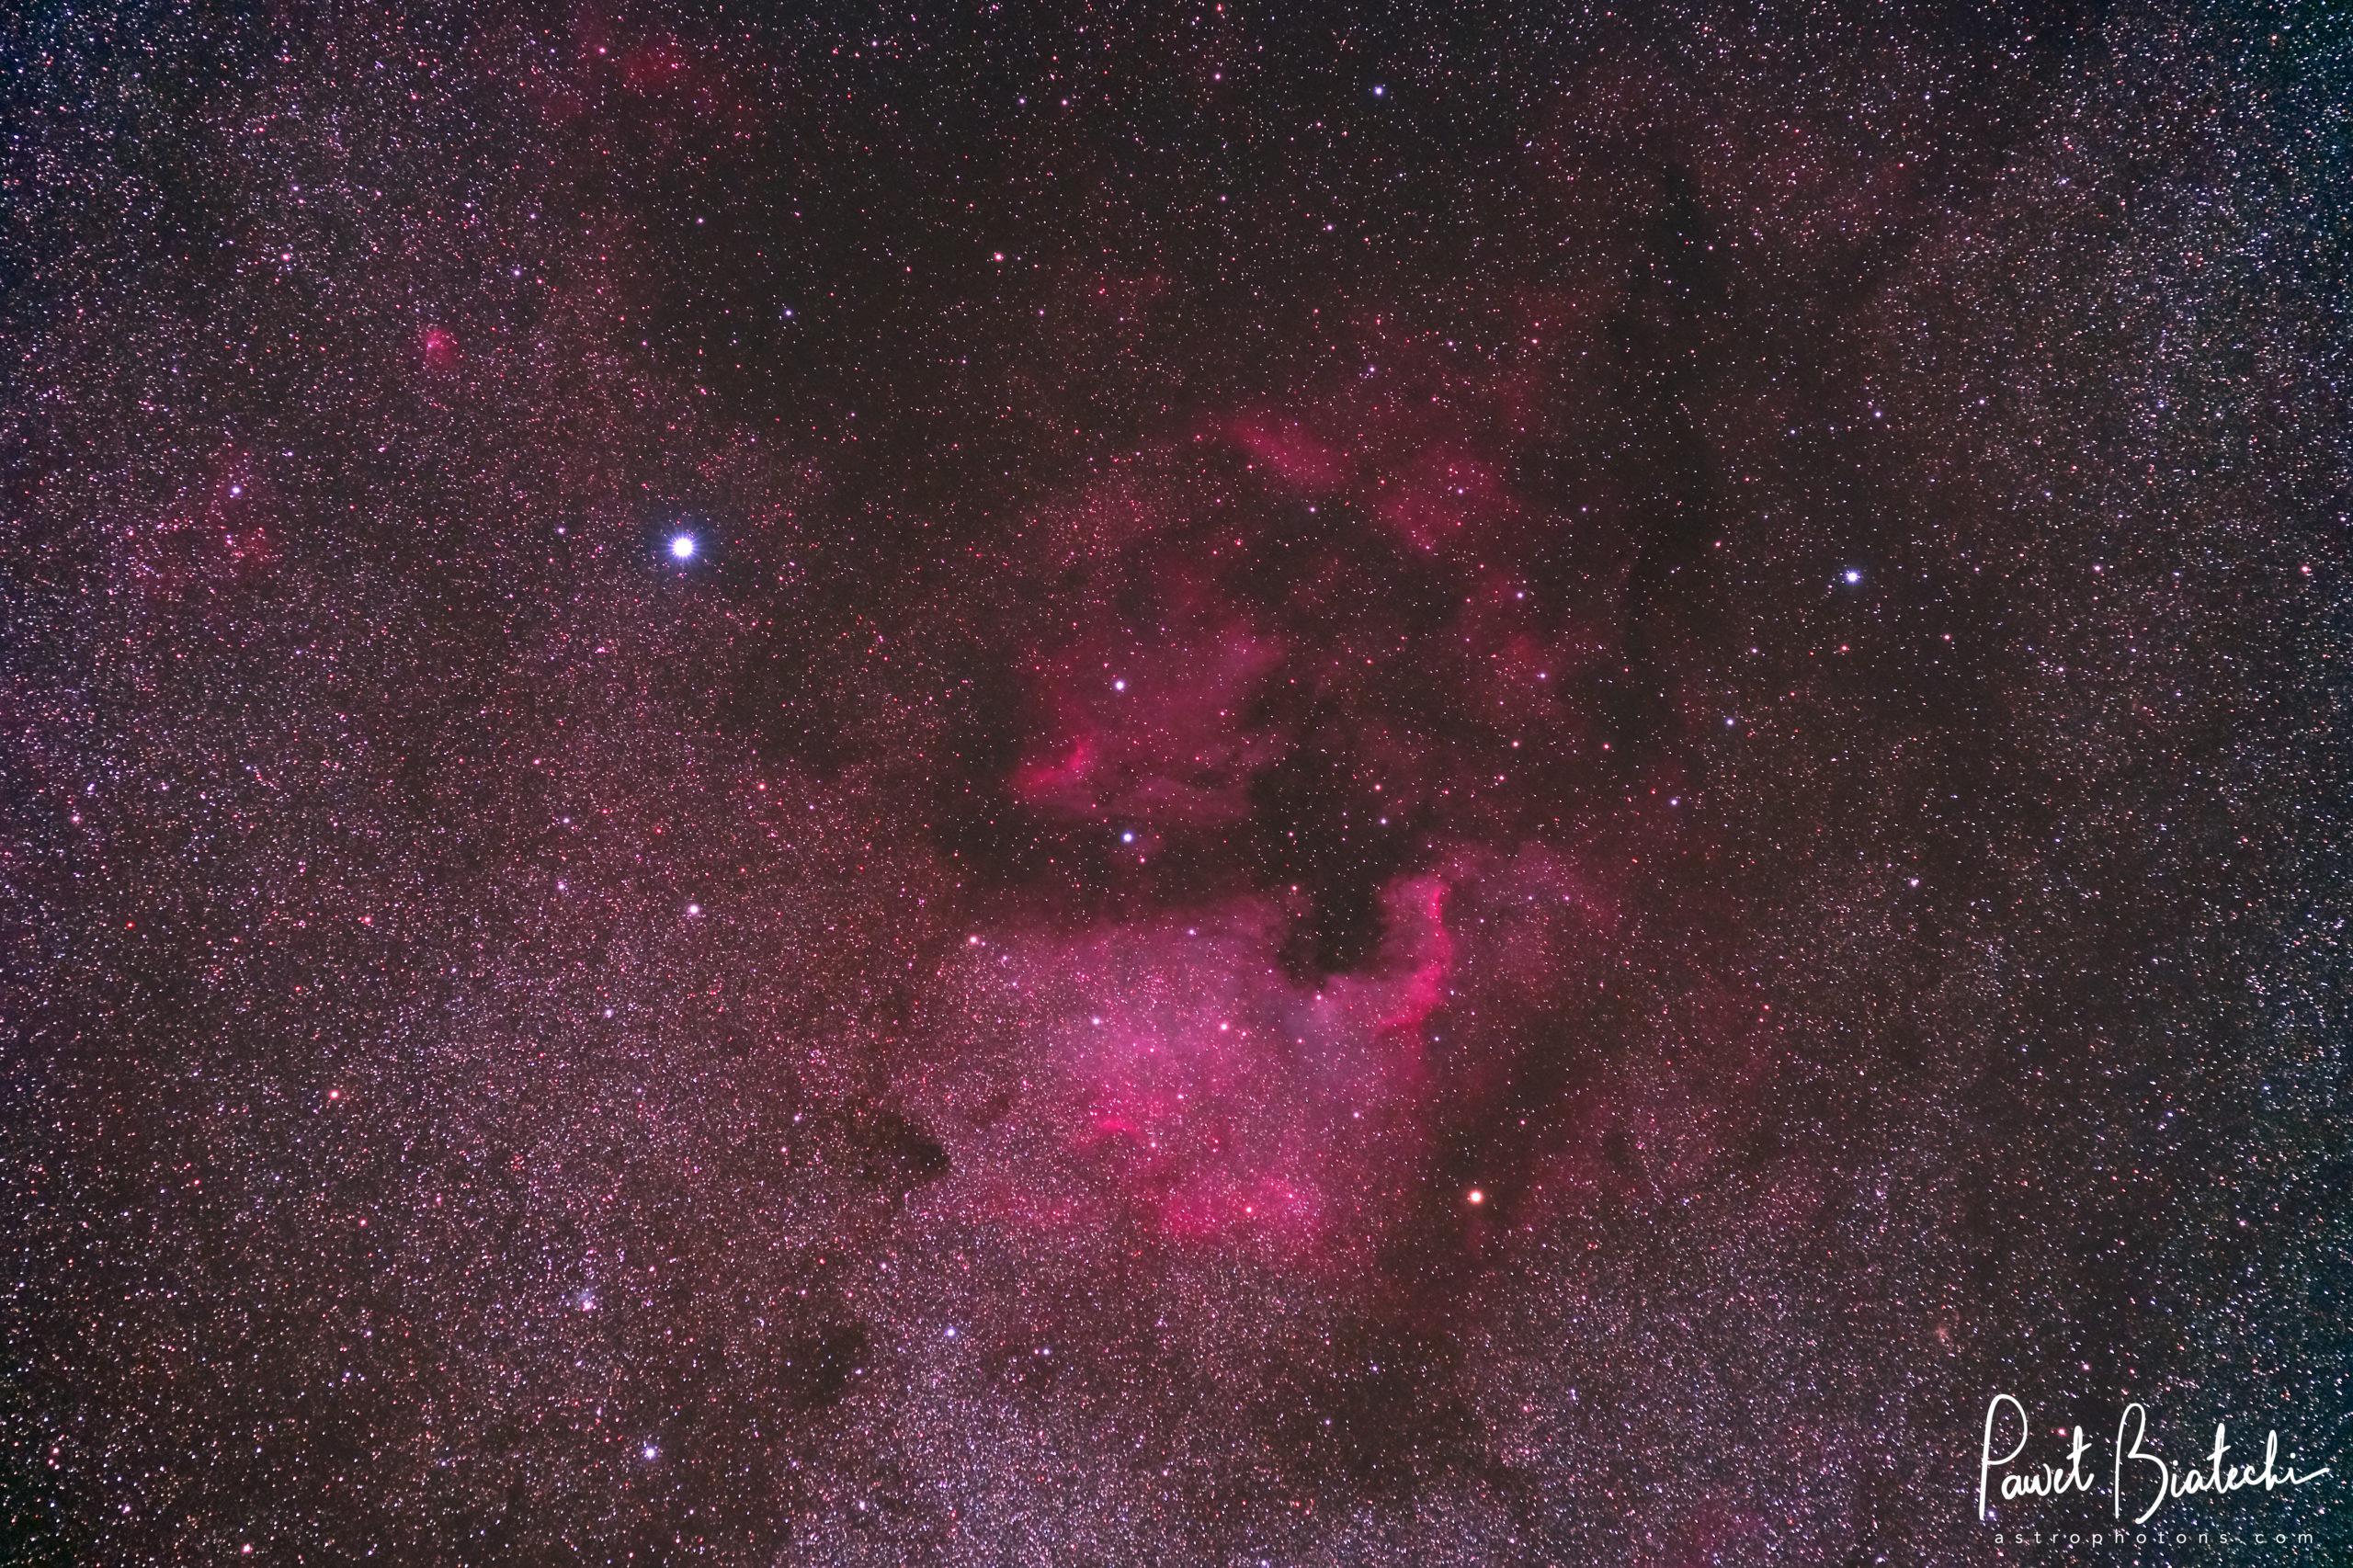 Astrophotography - North America Nebula (NGC 7000, Caldwell 20)